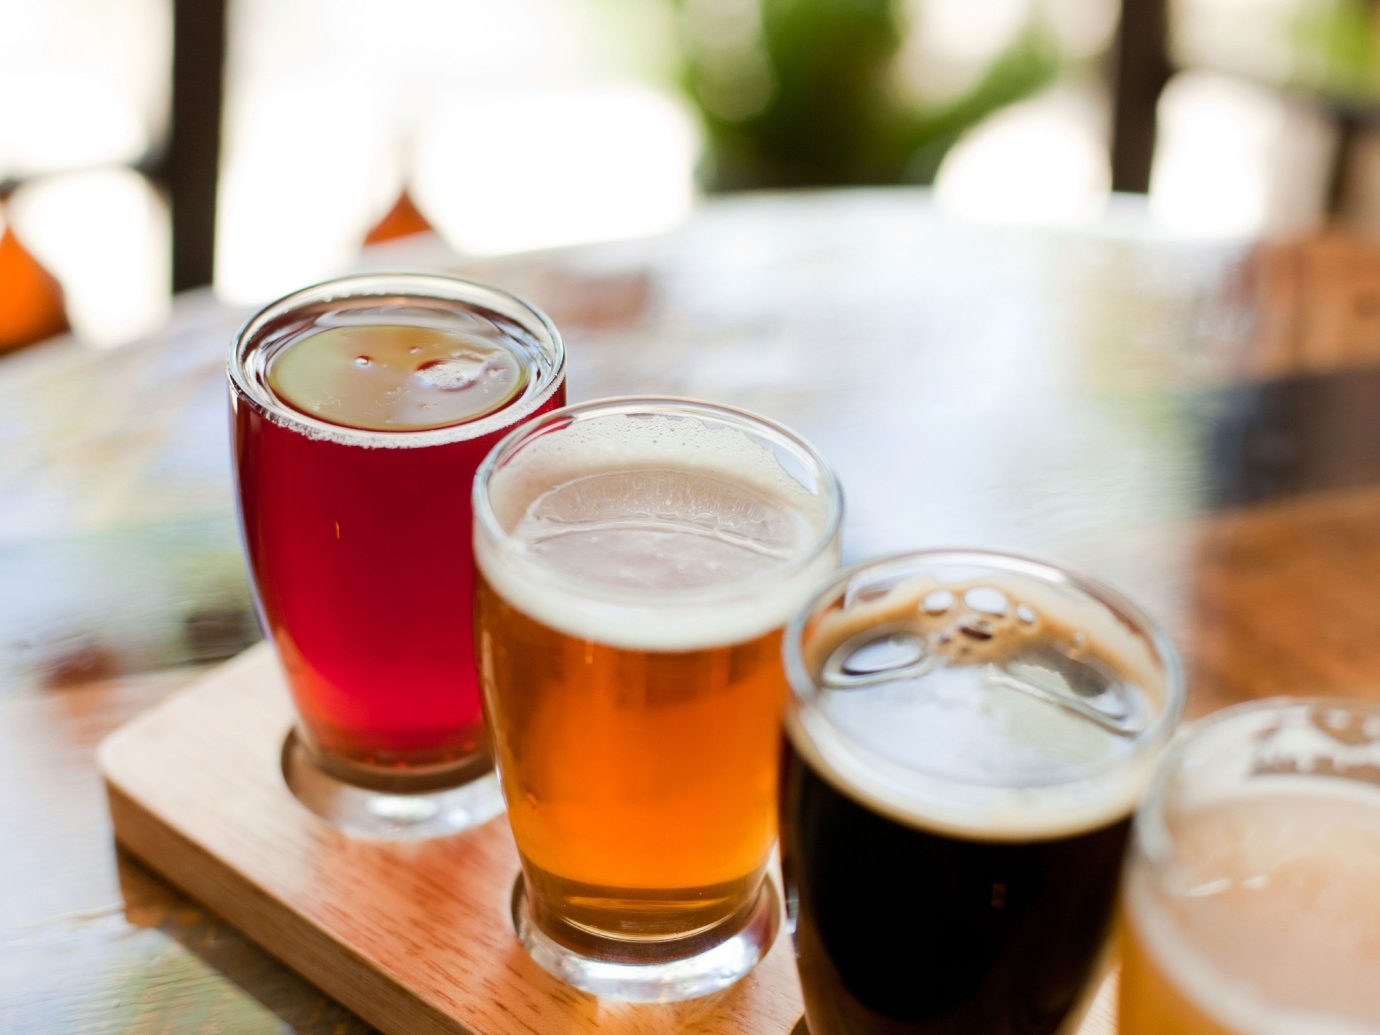 Trip Ideas cup table coffee food Drink glass alcoholic beverage beer beverage orange meal